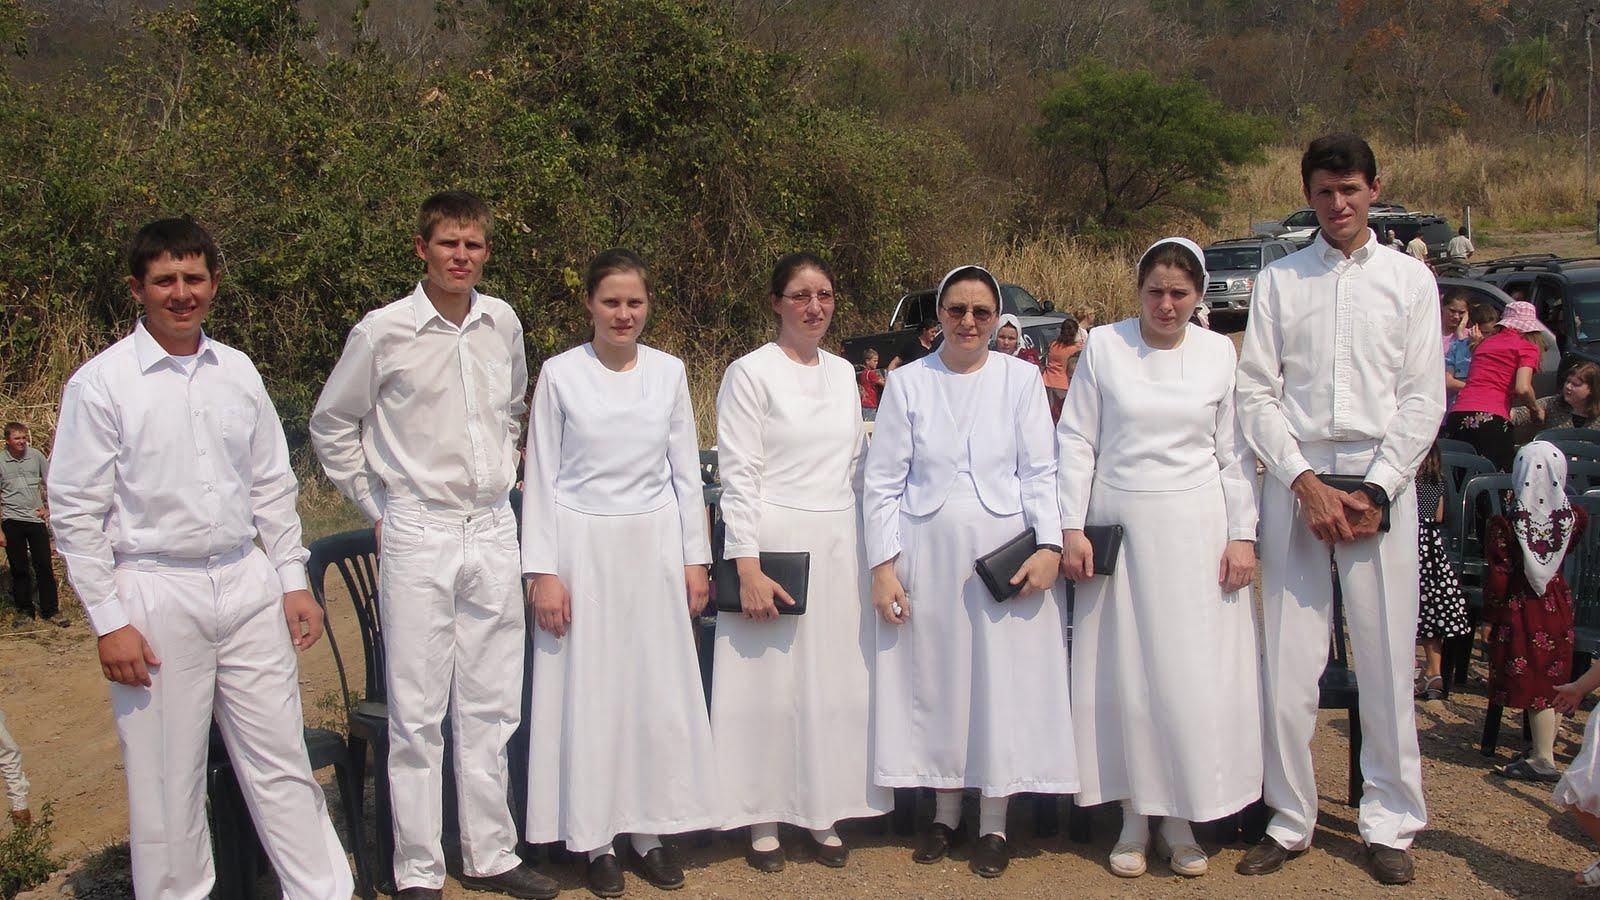 Taufe im Rio San Julian, San Ramon, Bolivien - Gemeinde Gottes Bolivia